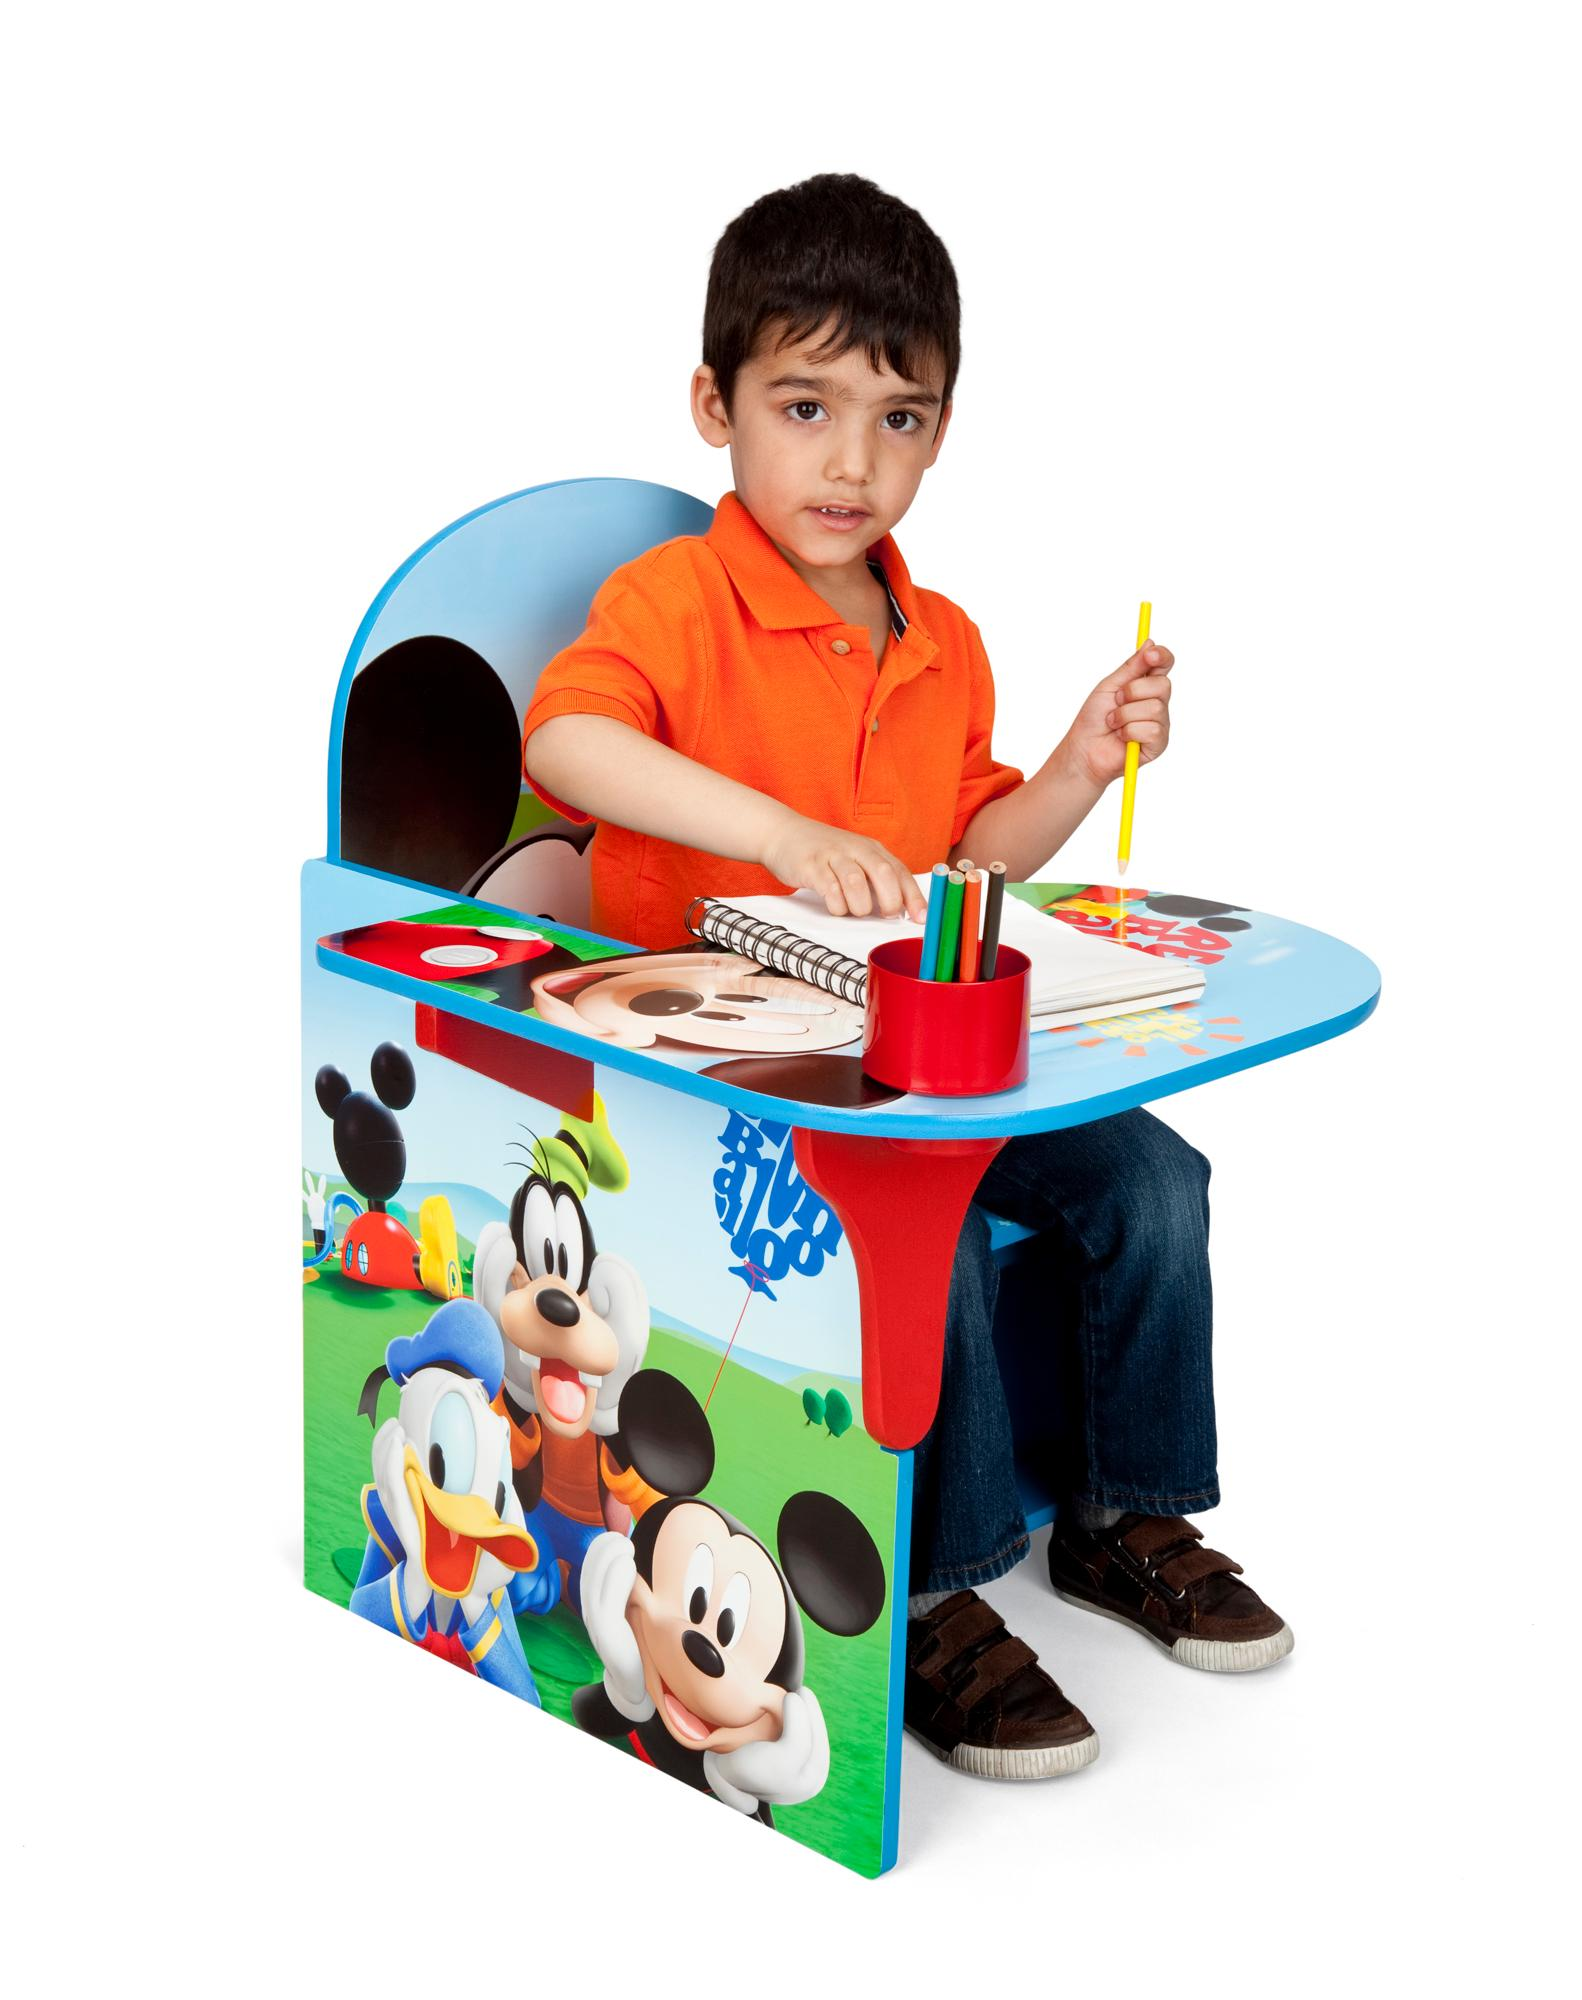 sesame street table and chairs swivel chair torkel amazon delta children desk with storage bin